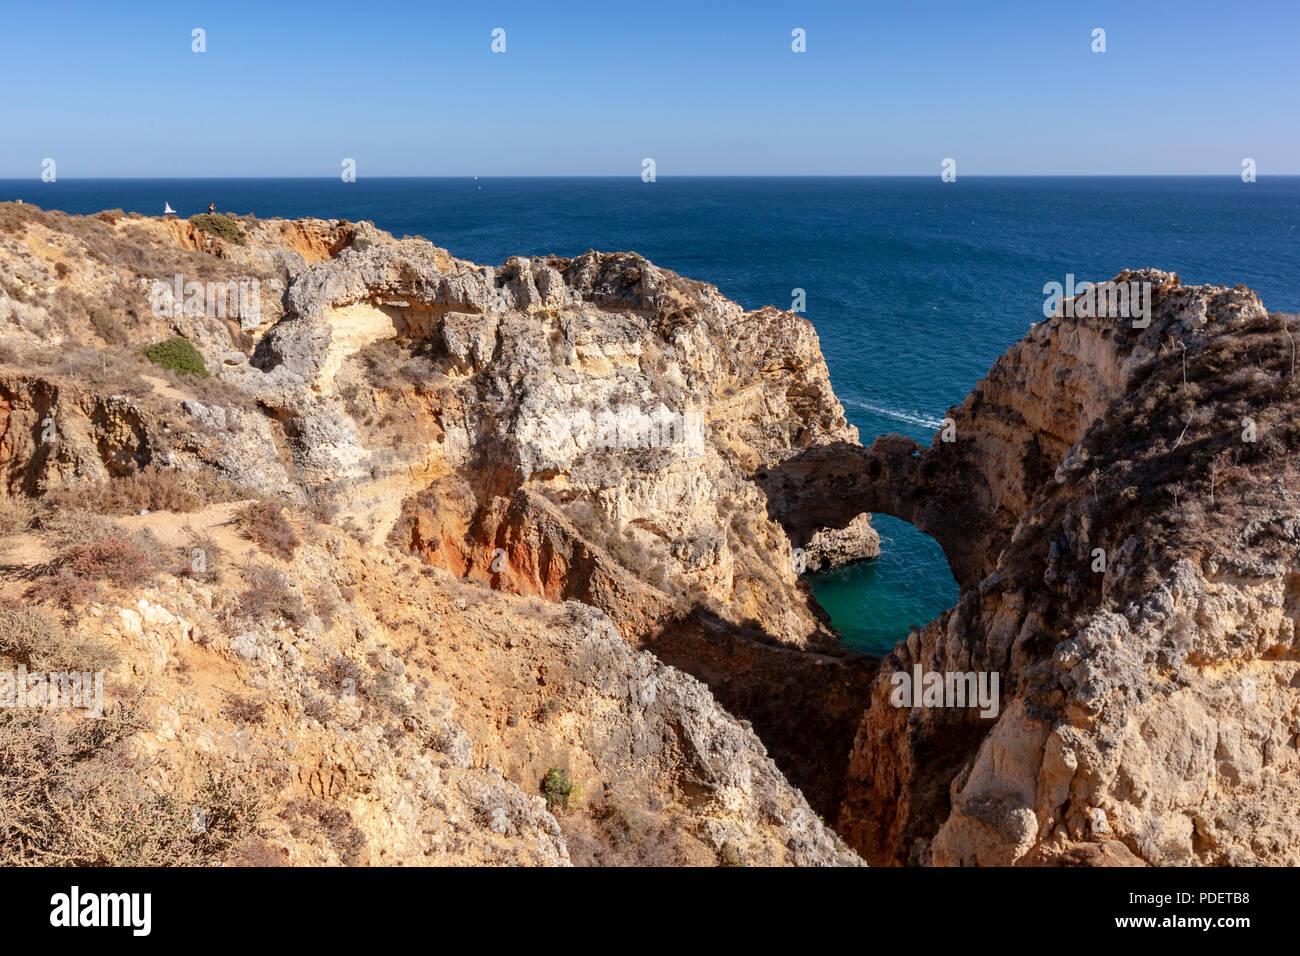 Picturesque views of rugged coastlines and sandstone cliffs near Farol da Ponta da Piedade, Lagos, Algarve, Portugal. - Stock Image